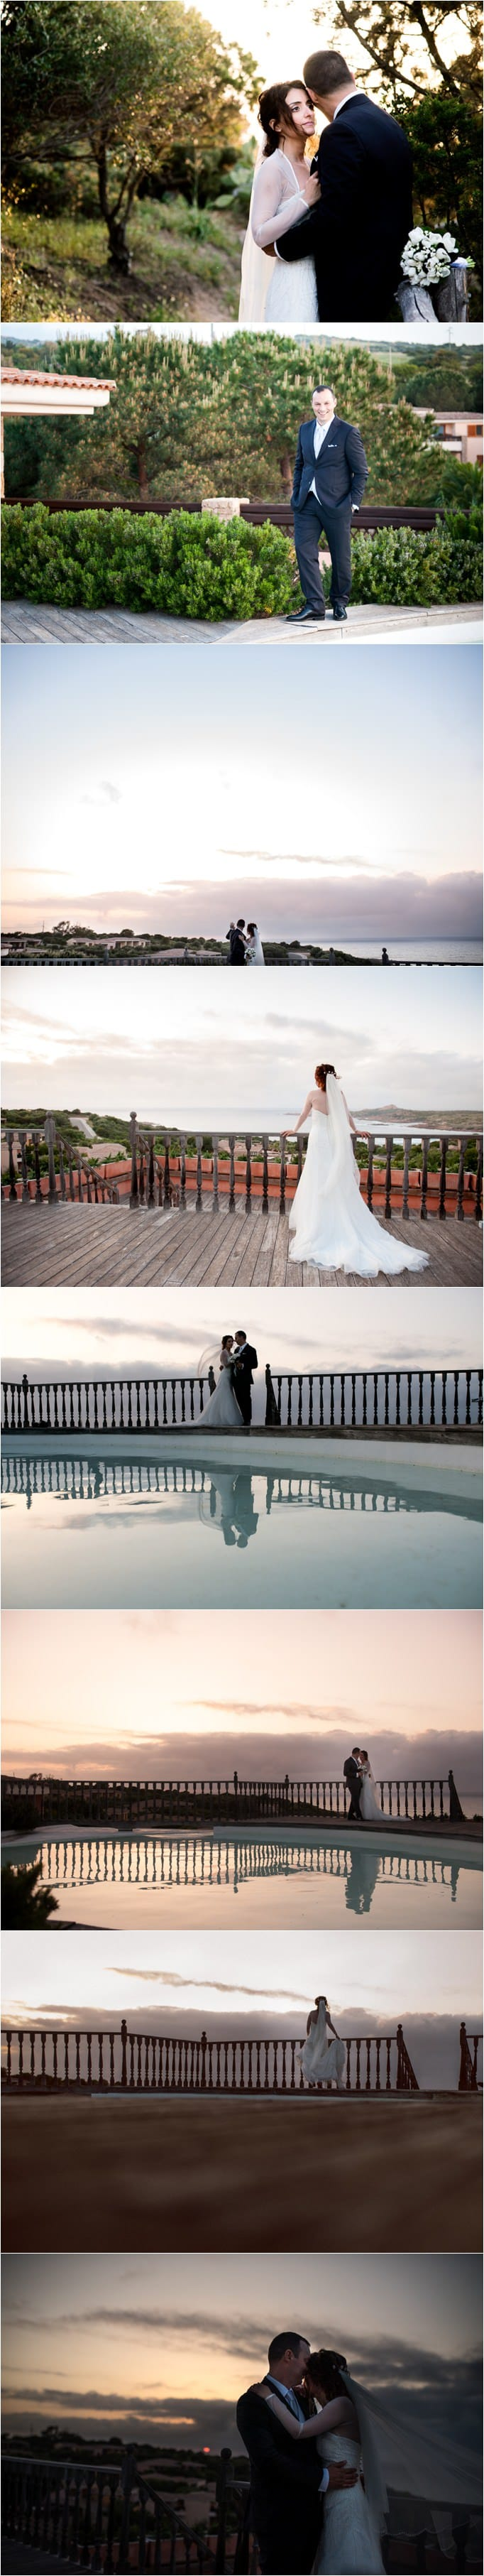 wedding isola rossa